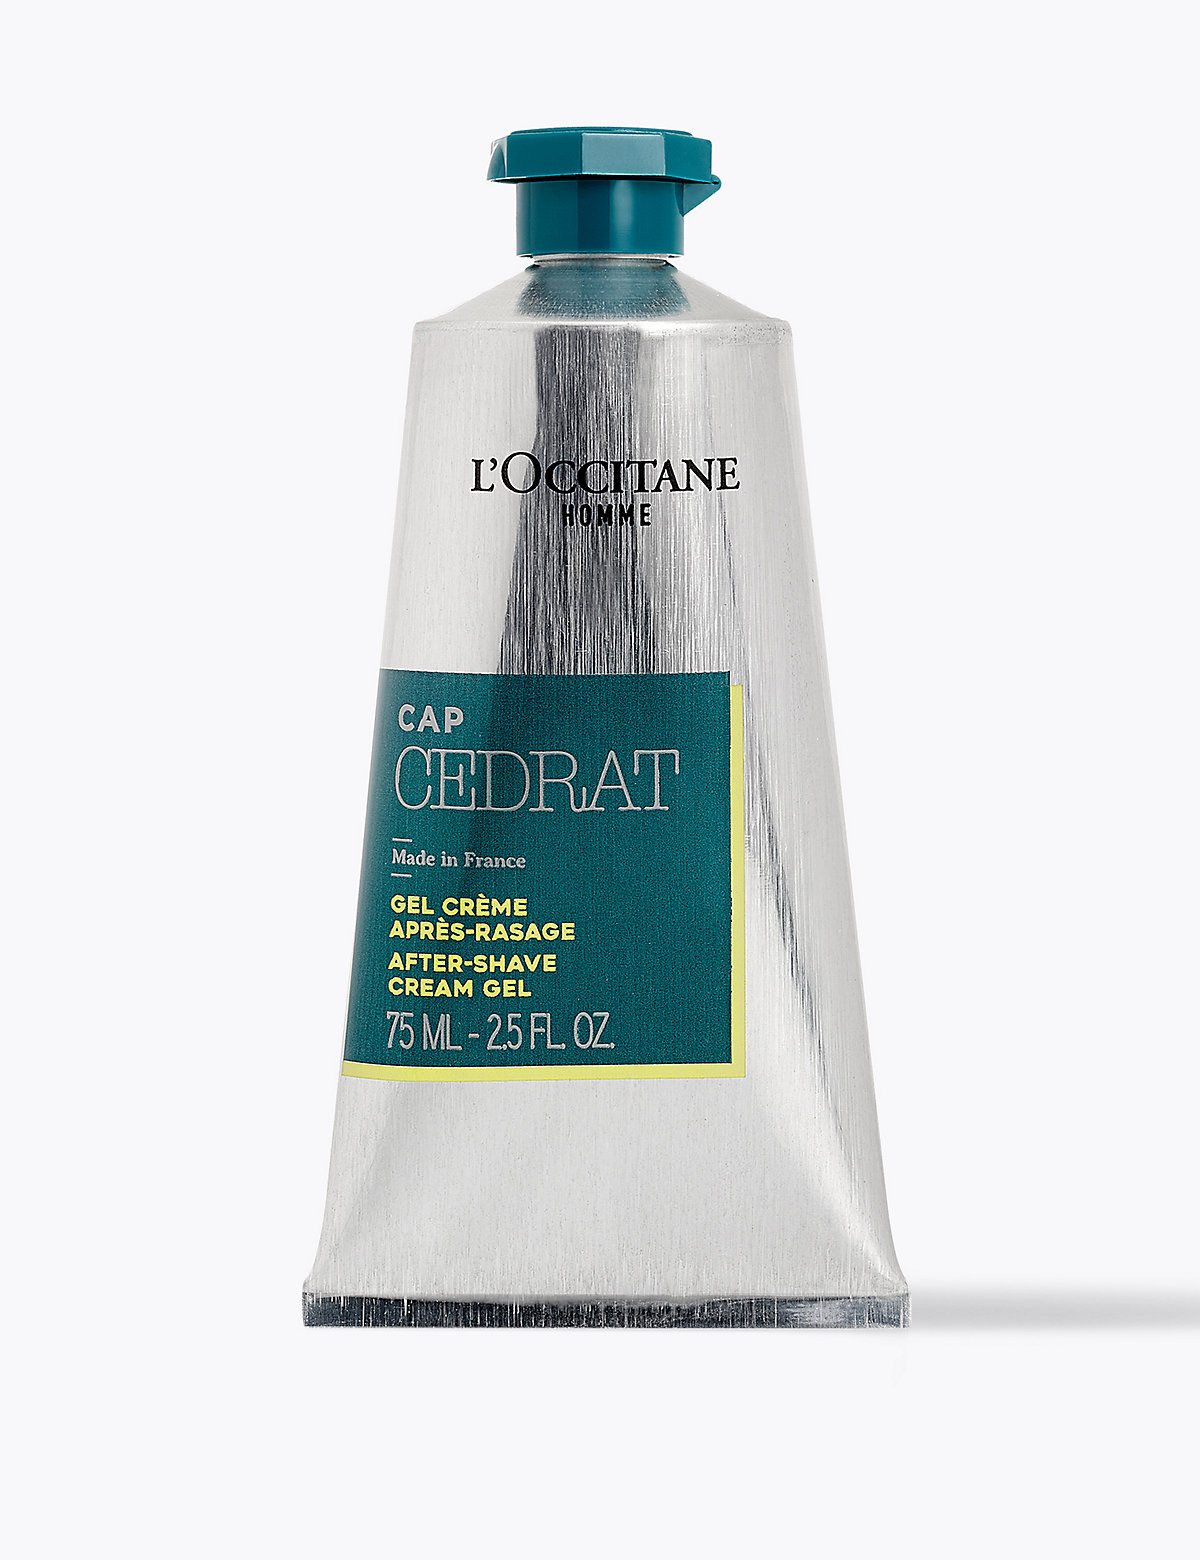 L'Occitane Cap Cedrat Aftershave Balm 75ml